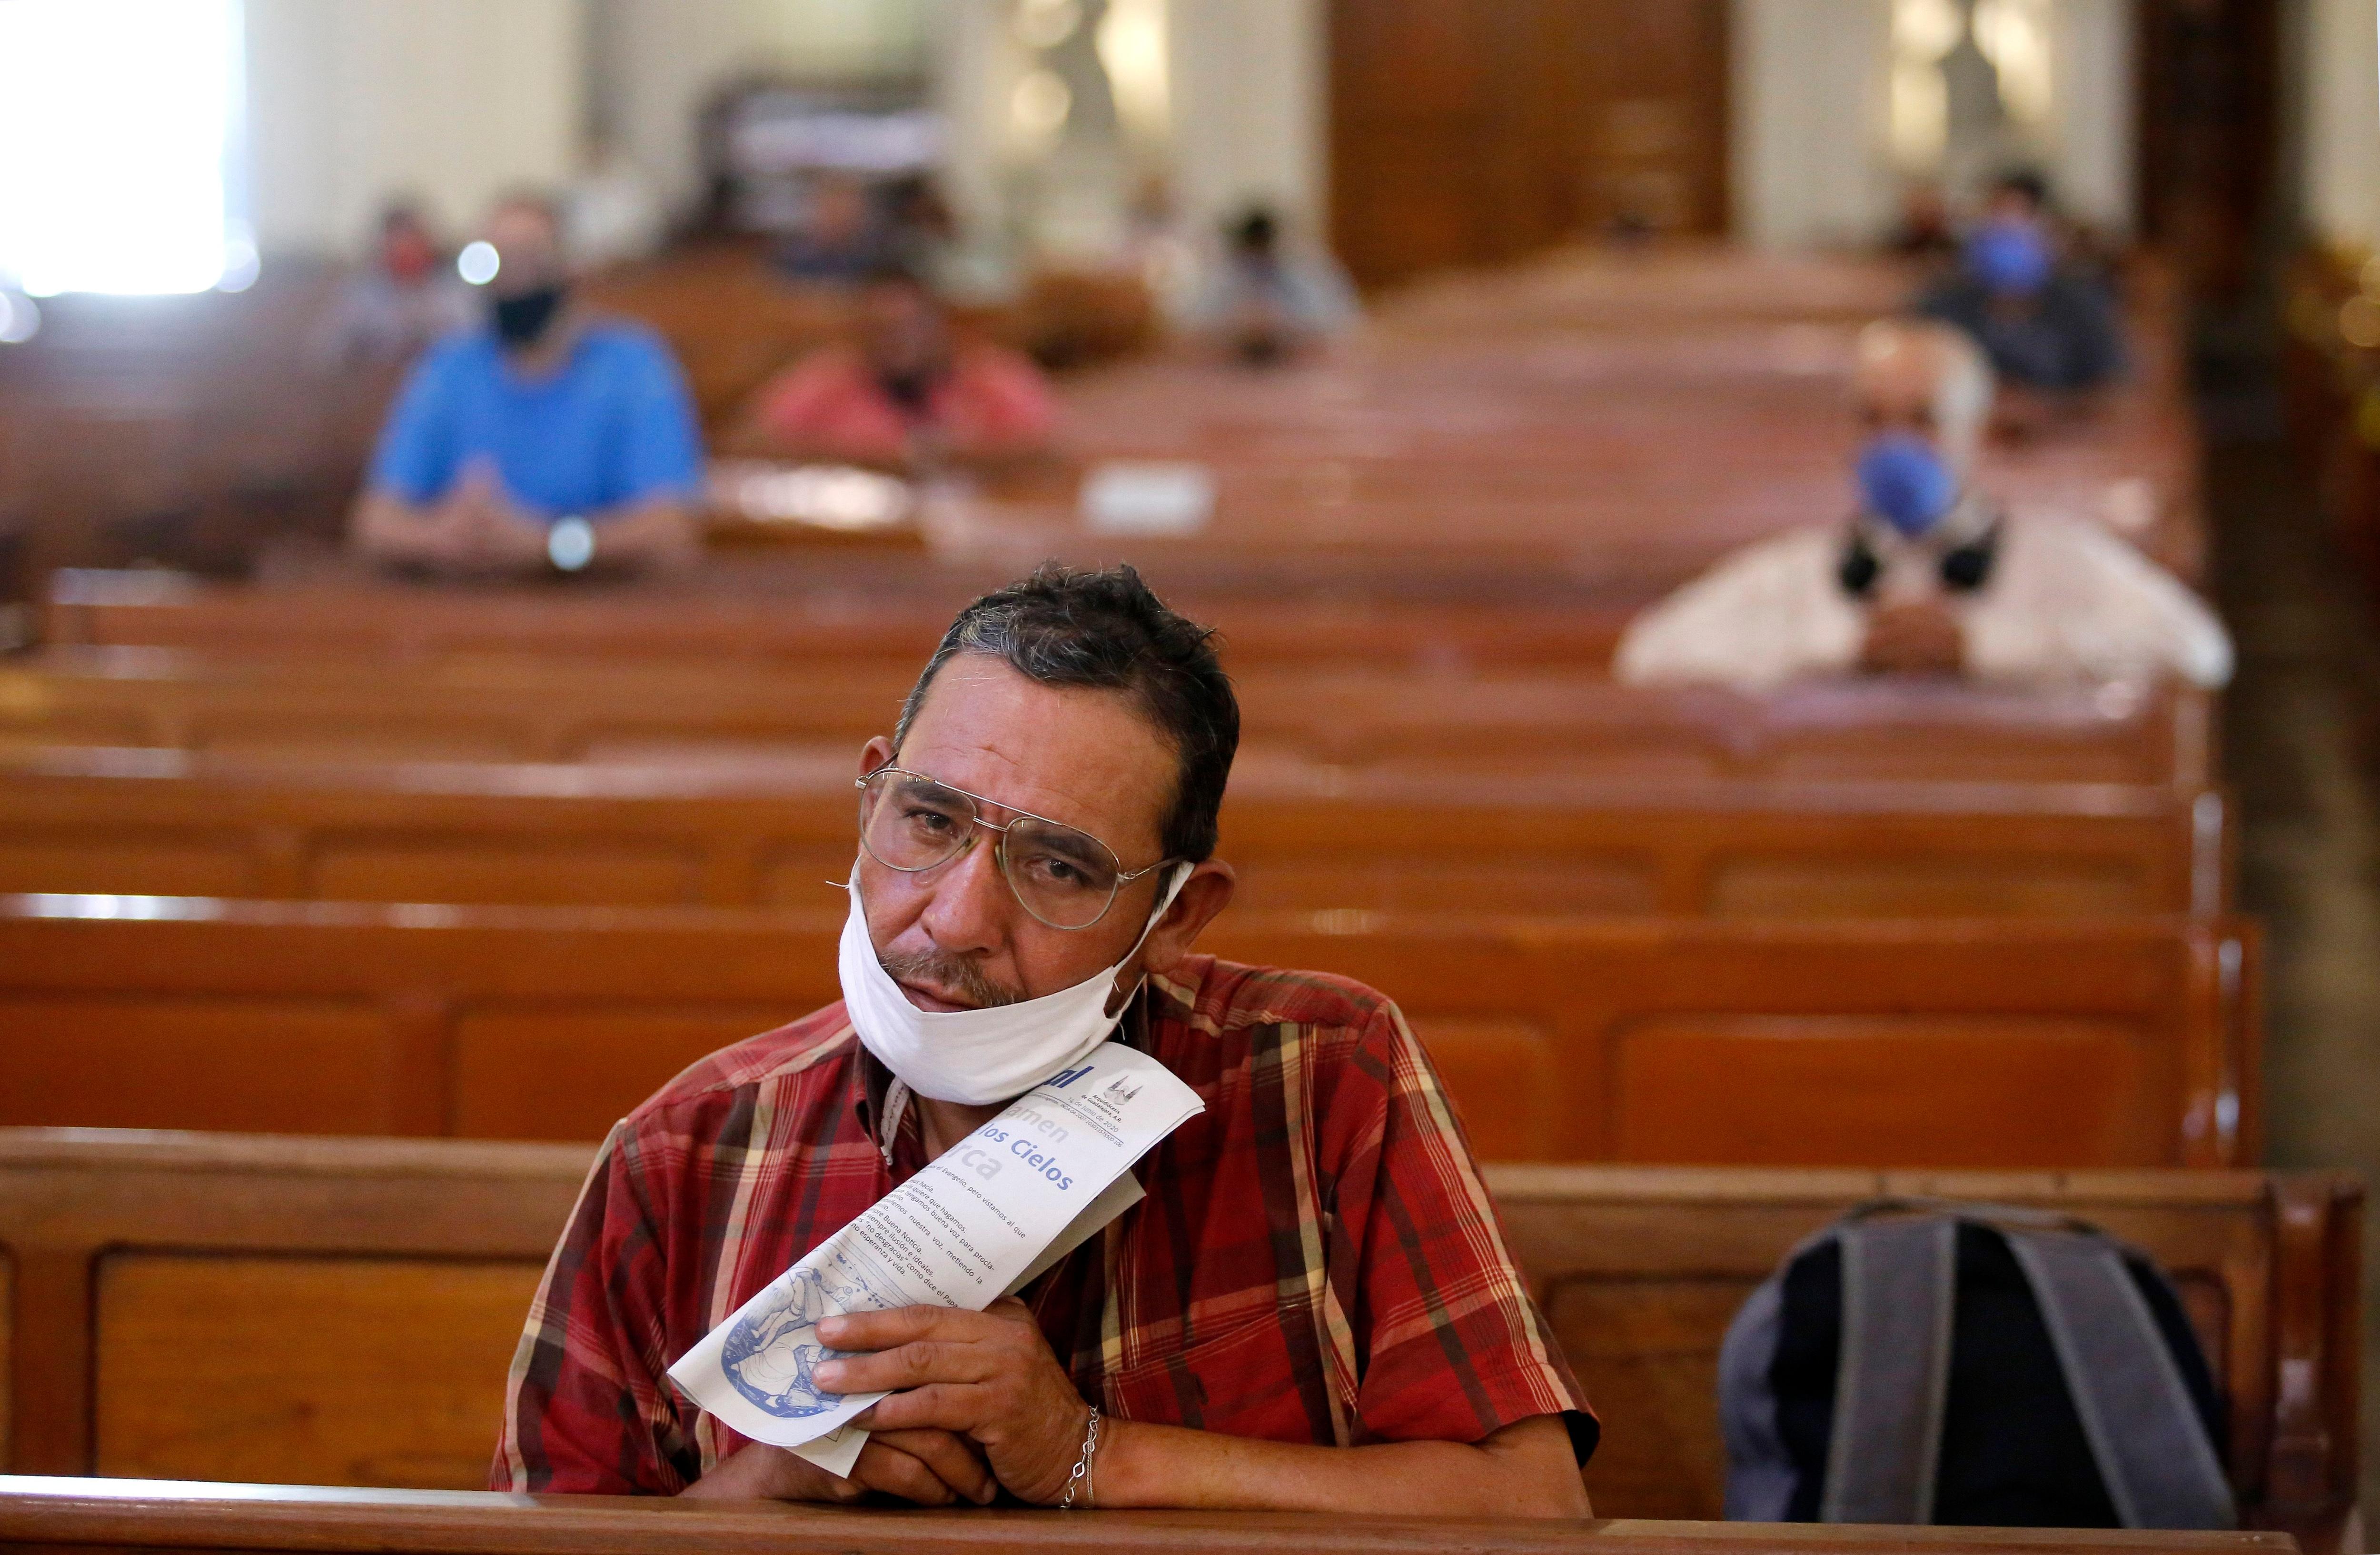 Iglesia - guadalajara -covid19 -coronavirus - mexico - 06162020